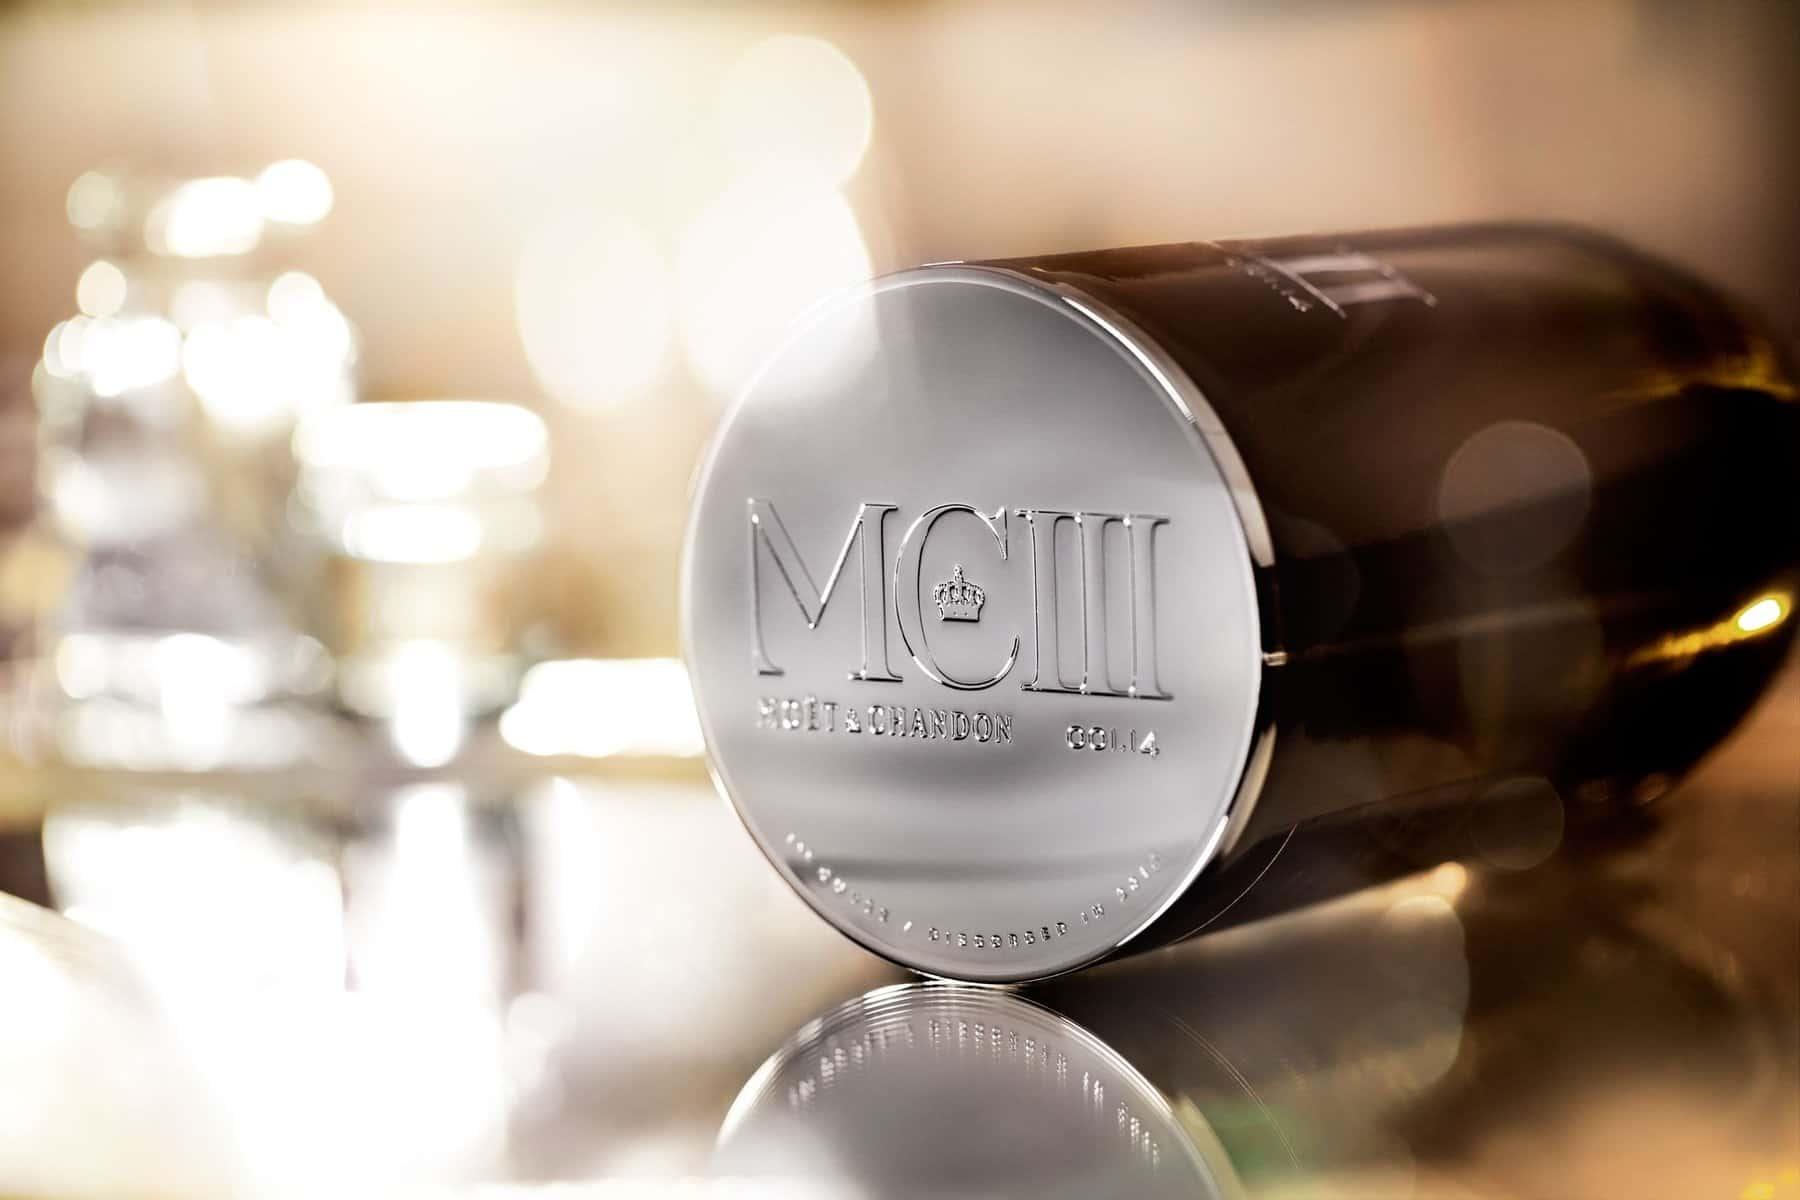 Moët & Chandon MCIII Champagne